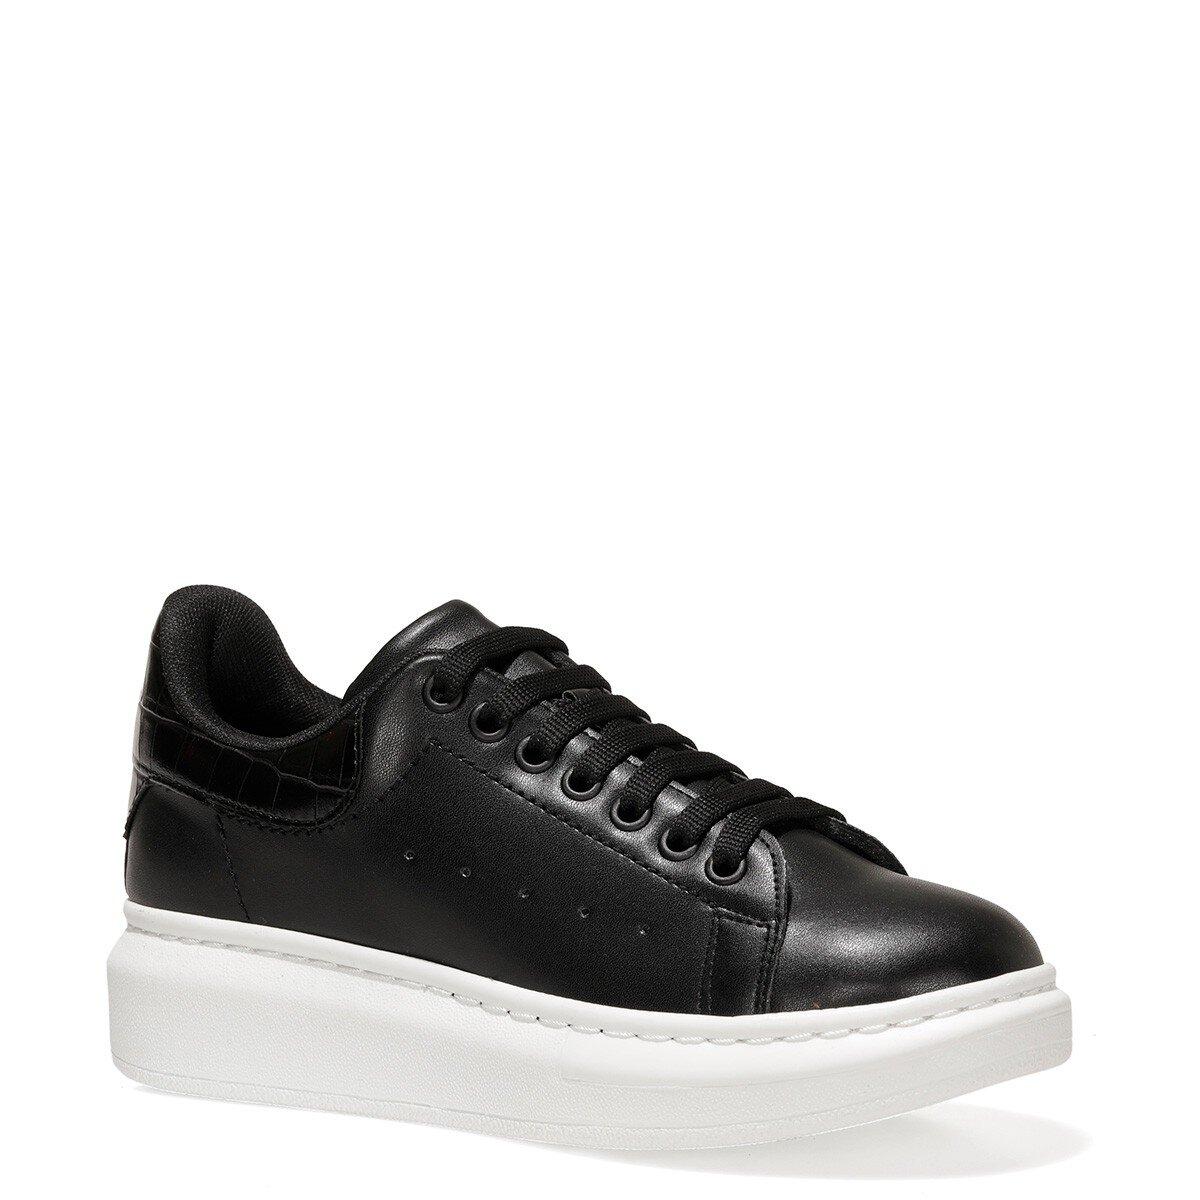 GOWER 1FX Siyah Kadın Sneaker